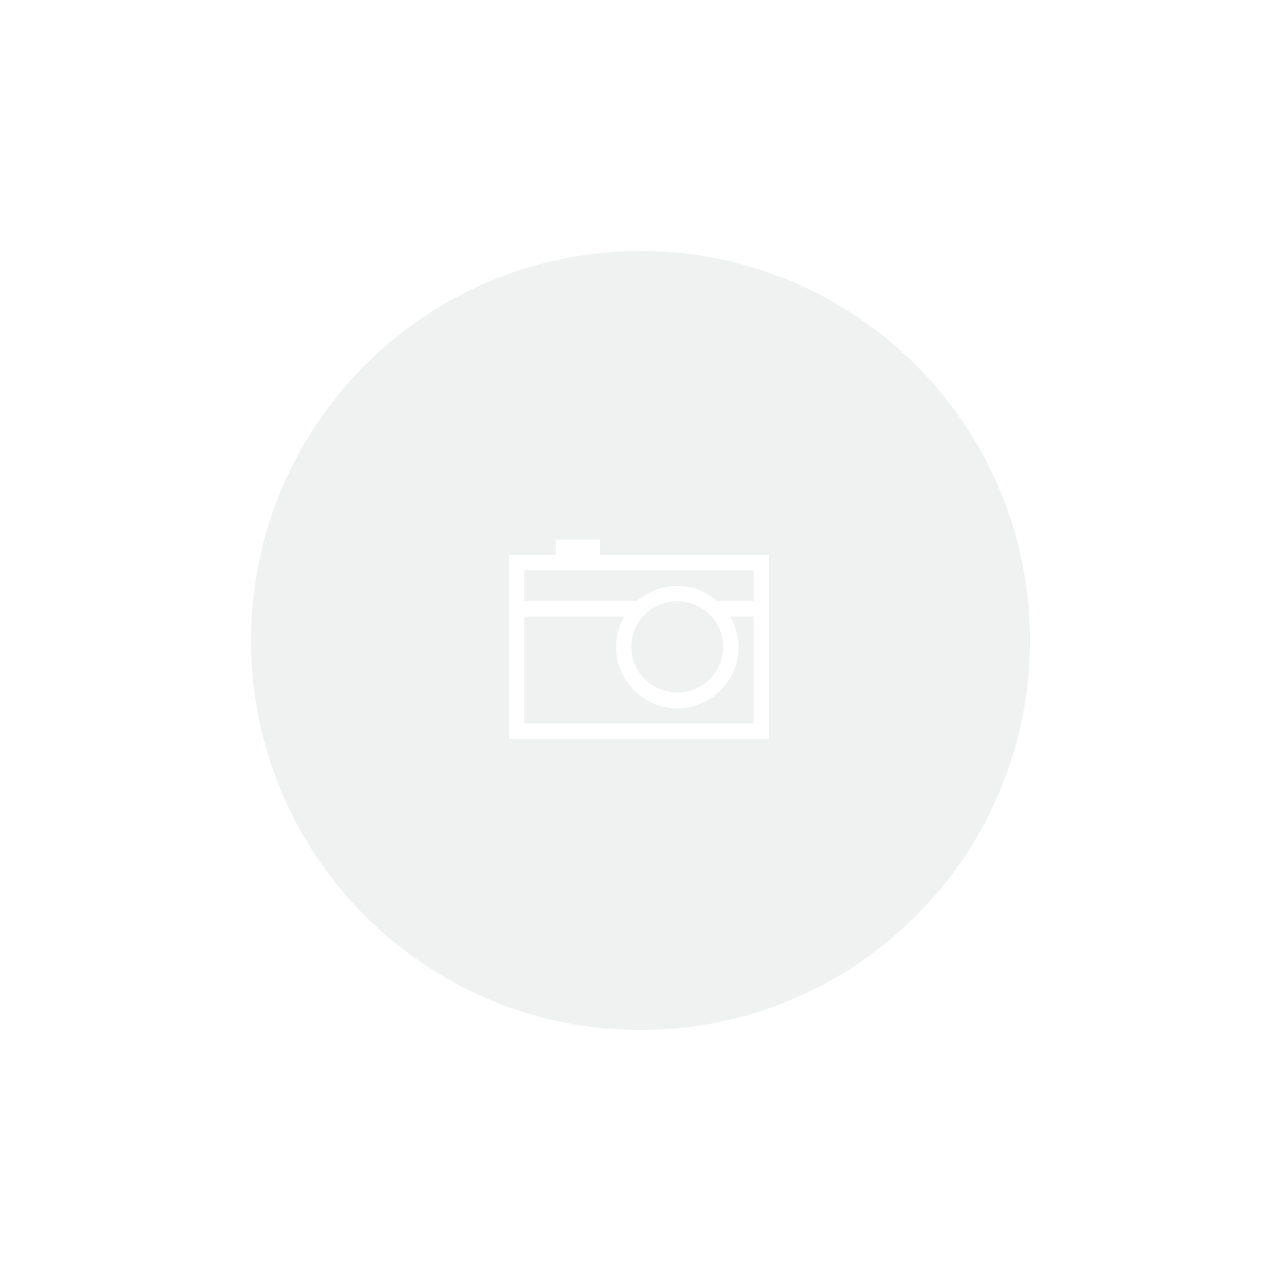 Panela Inox 20Cm 3,10 Litros Trix Tramontina